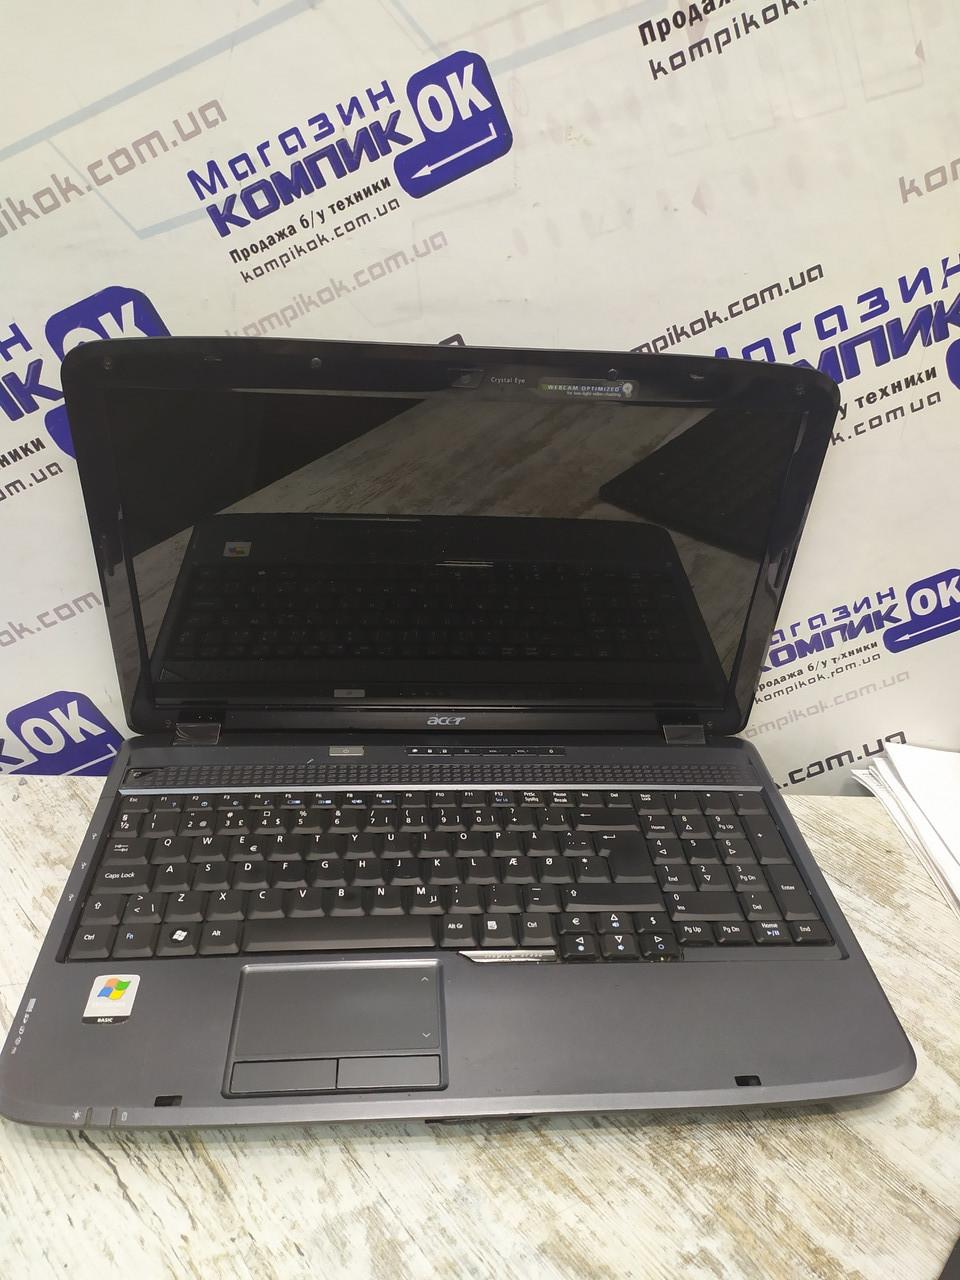 Ноутбук, notebook, Acer Aspire 5735Z, 2 ядра, 4 Гб ОЗУ, HDD 250 Гб